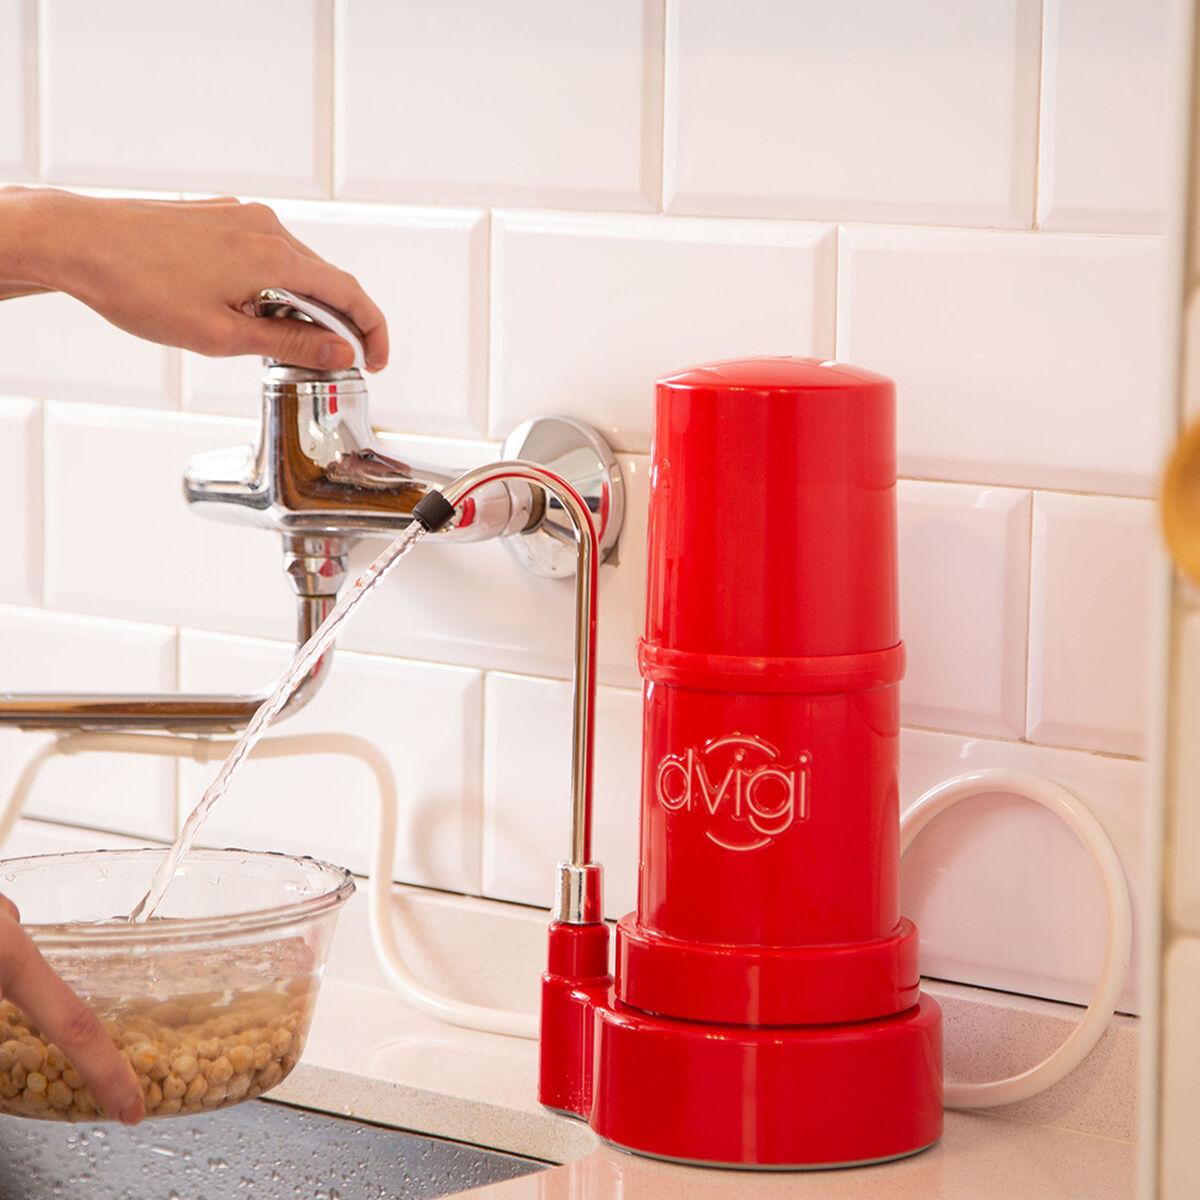 Purificador de Agua Dvigi Filtro Sobre Cubierta Rojo